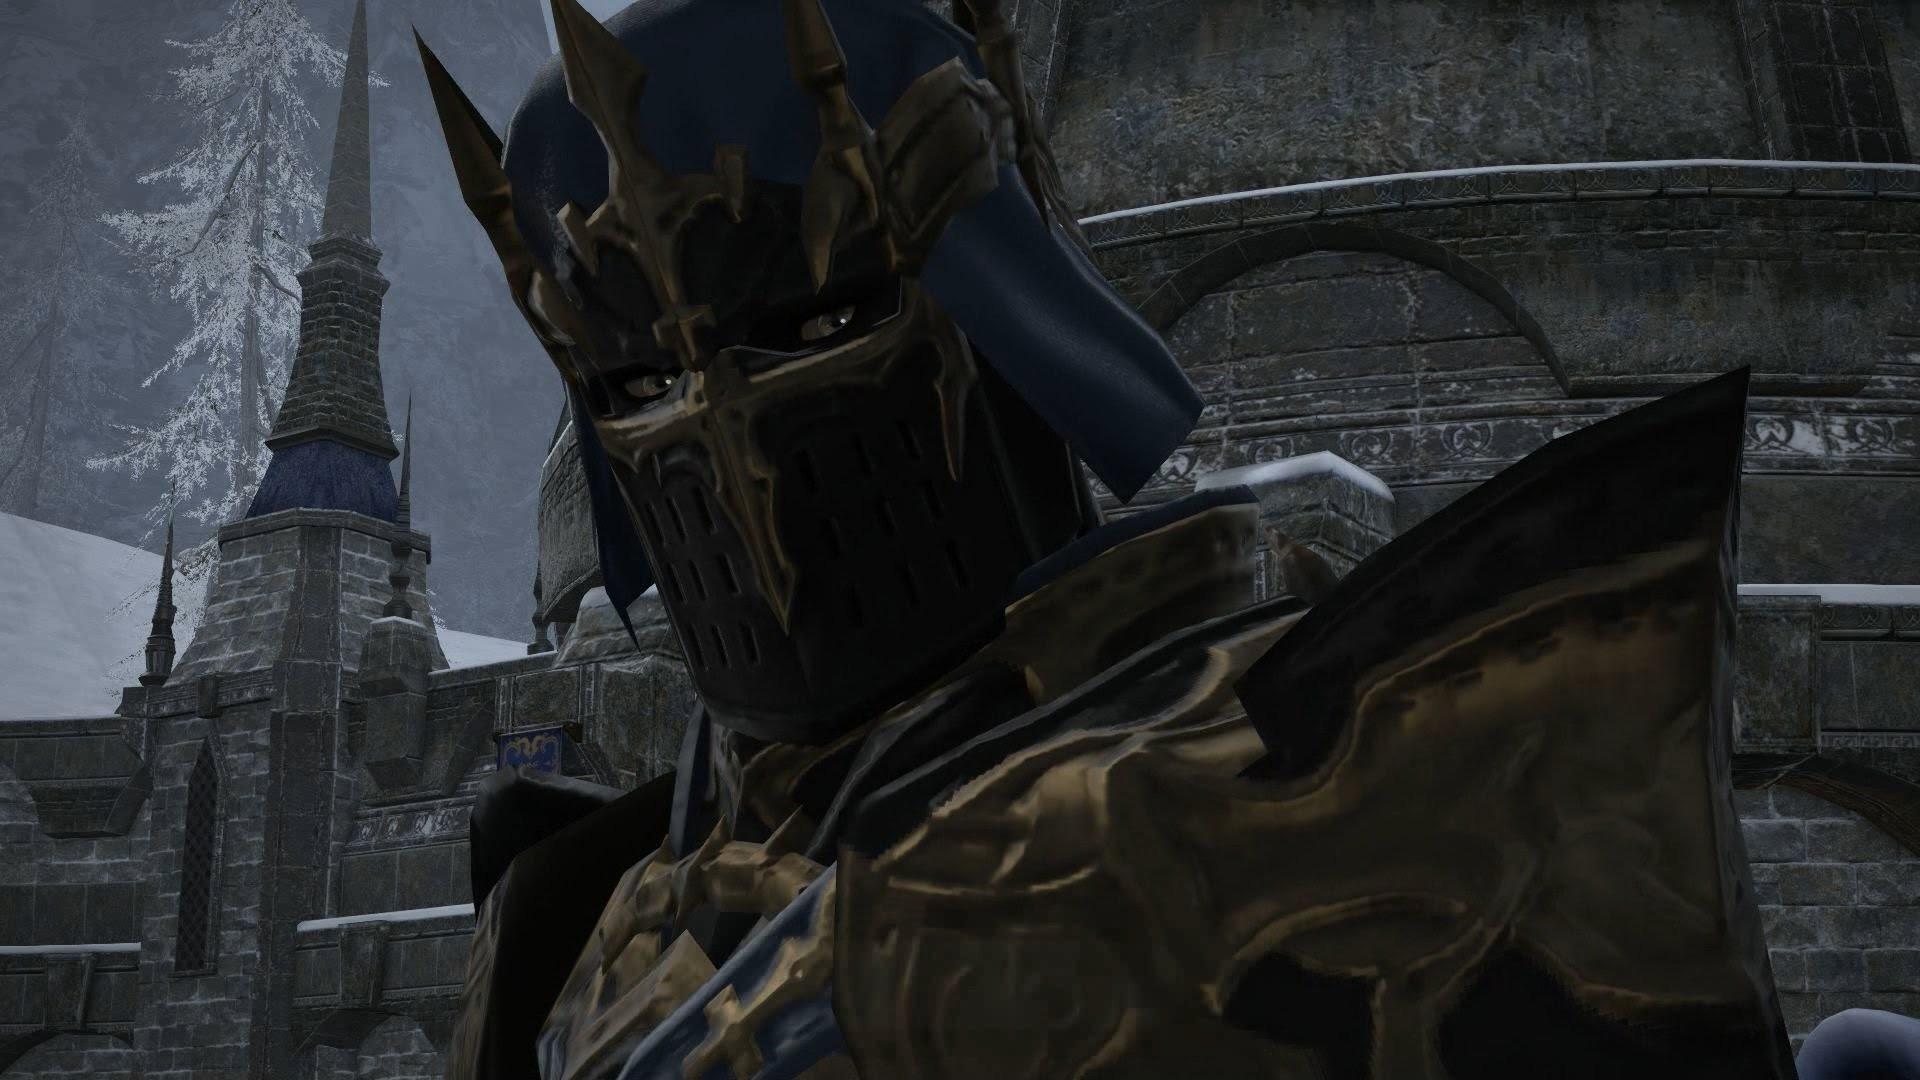 Final Fantasy XIV: The Movie – job quests (Dark Knight pt1)